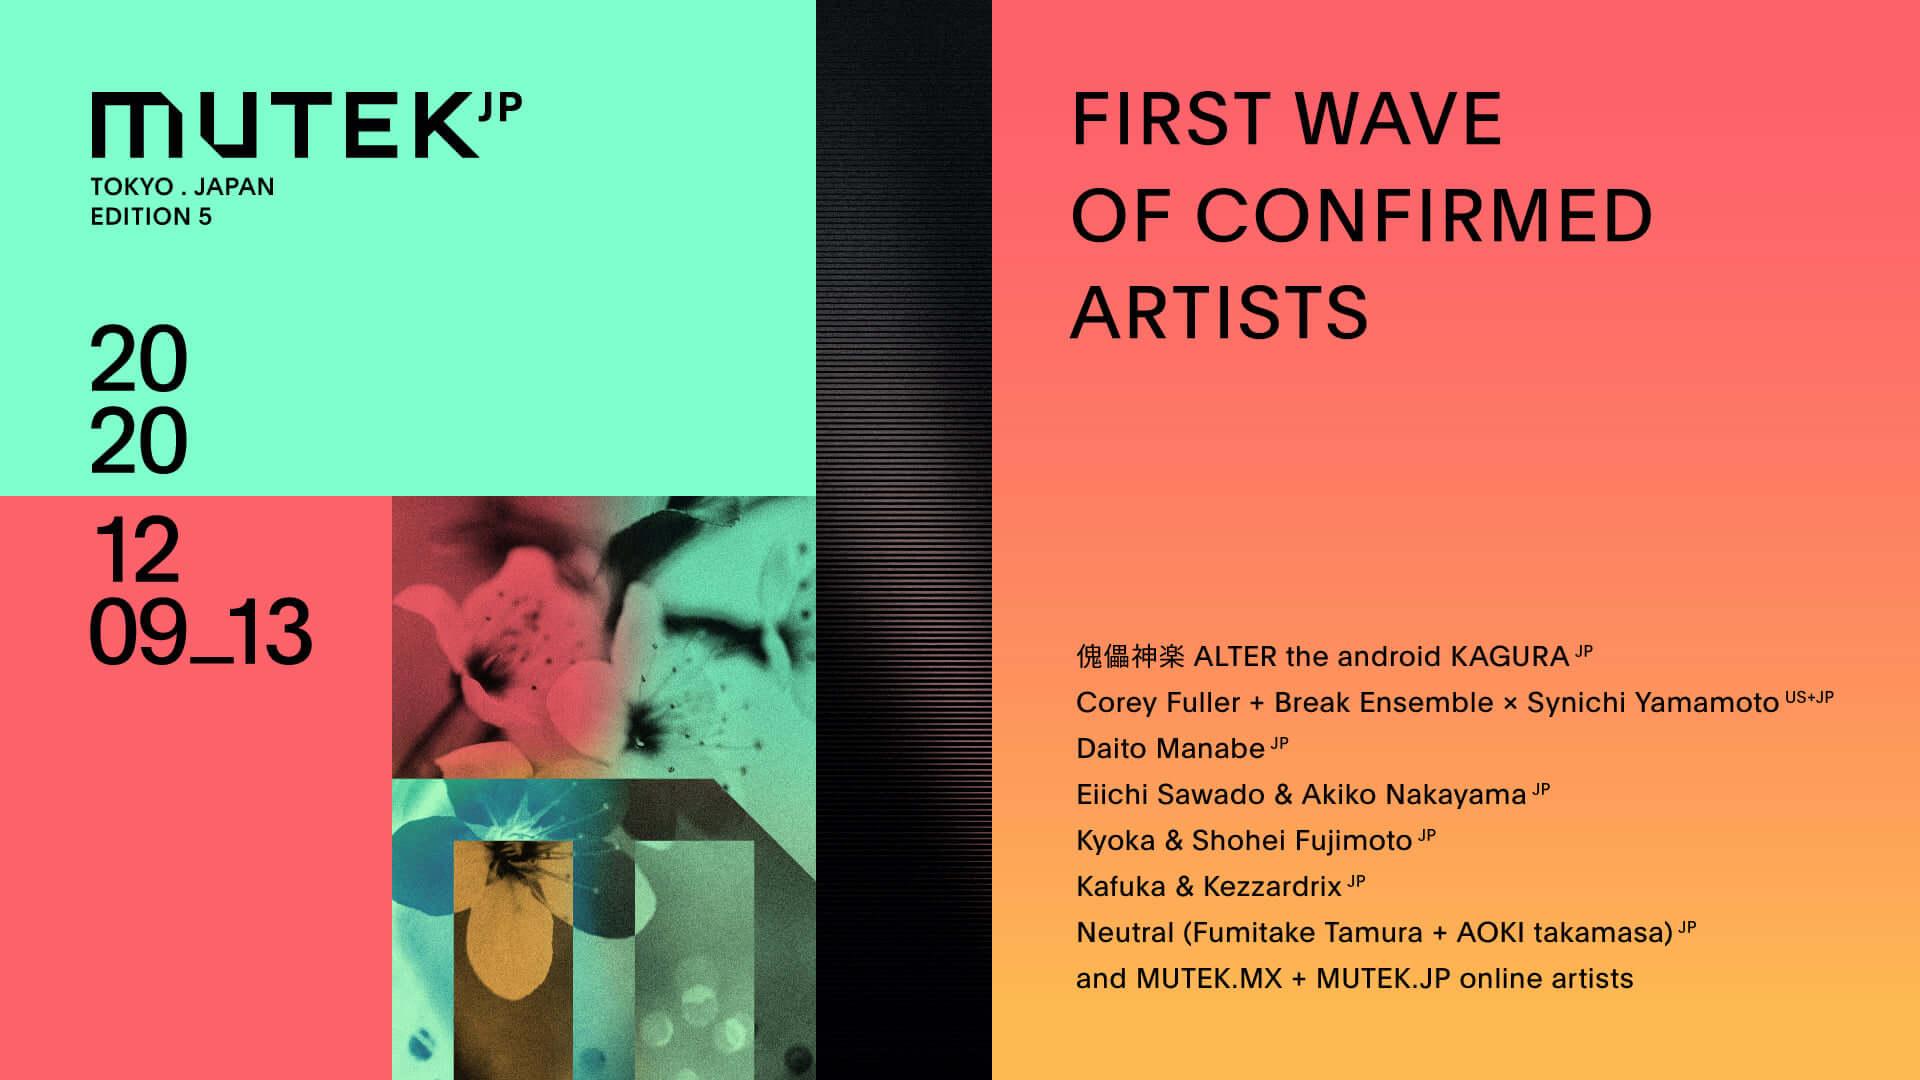 <MUTEK.JP 2020>がリアル&オンラインイベントとして開催決定!真鍋大度、中山晃子、Kyoka、Shohei Fujimoto、Neutralらが出演 art201111_mutek_2-1920x1080